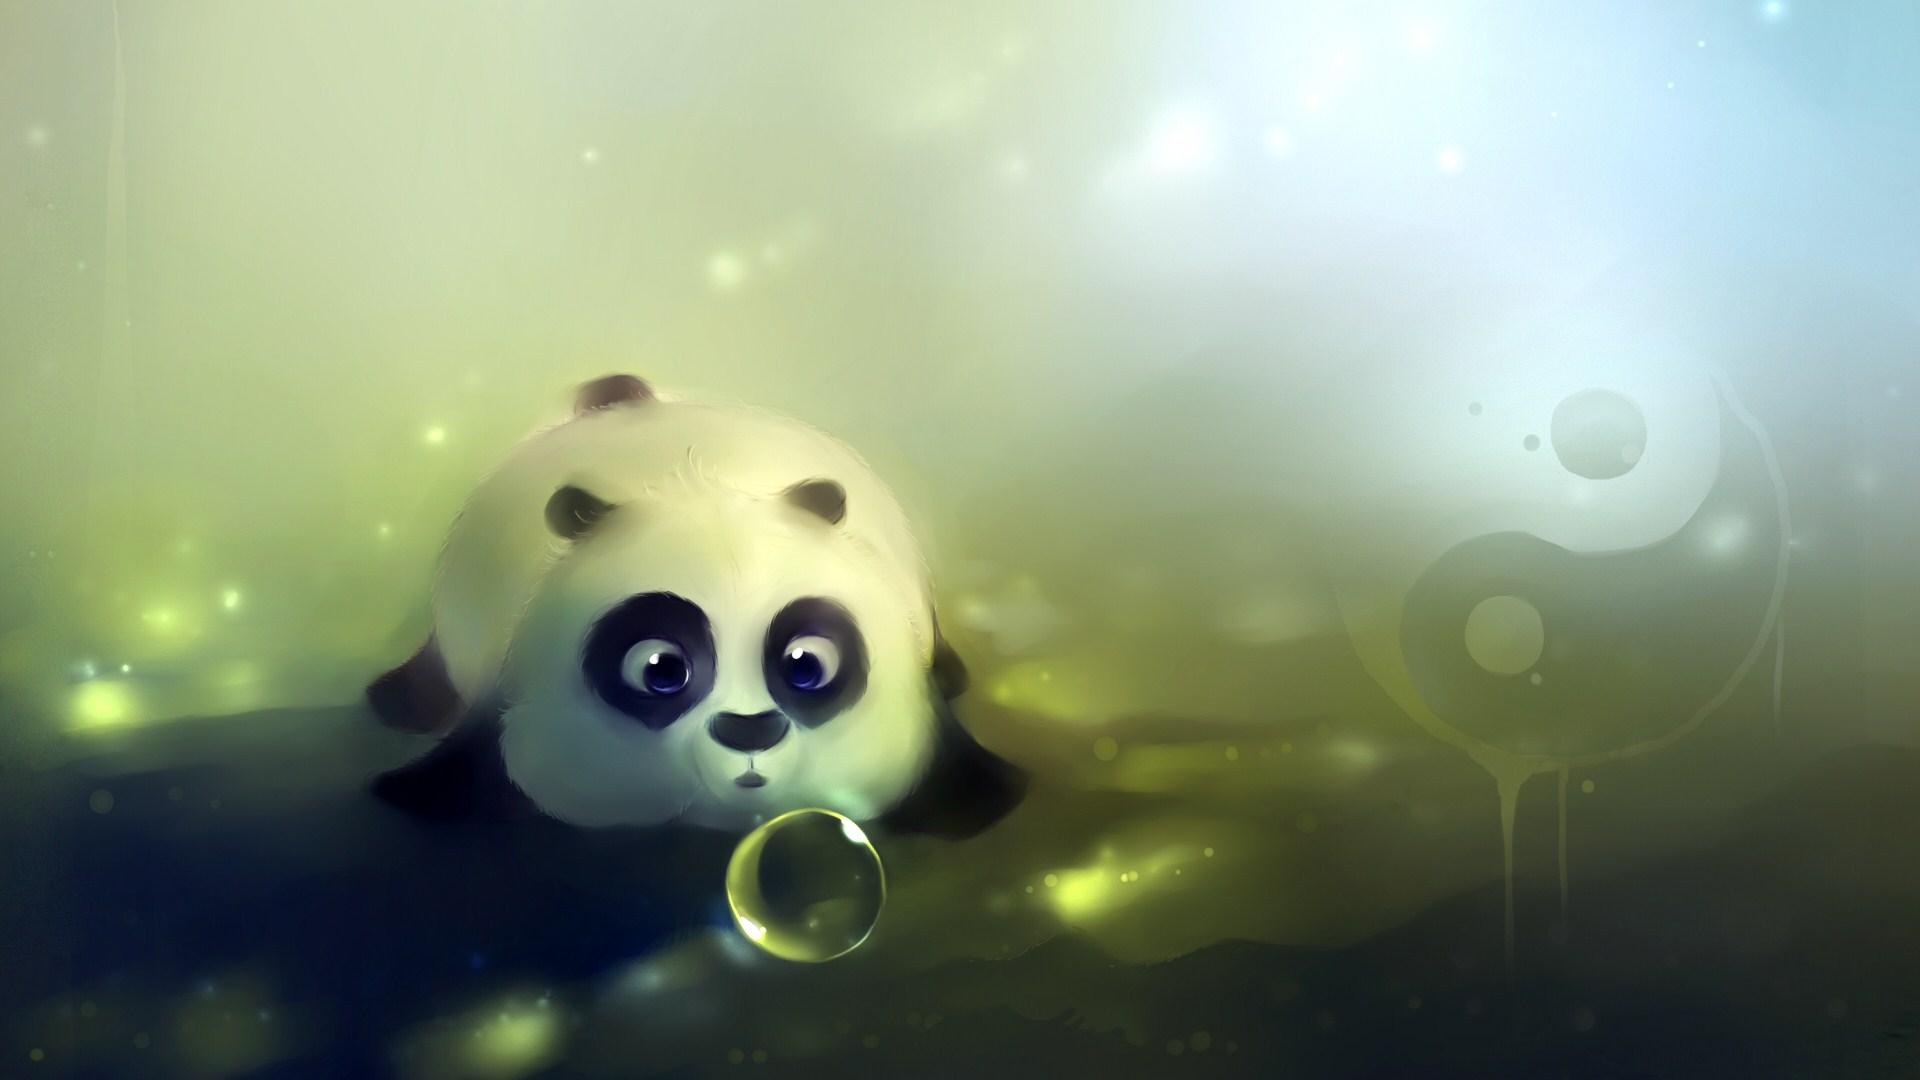 Panda Cartoon HD Desktop Wallpaper HD Desktop Wallpaper 1920x1080